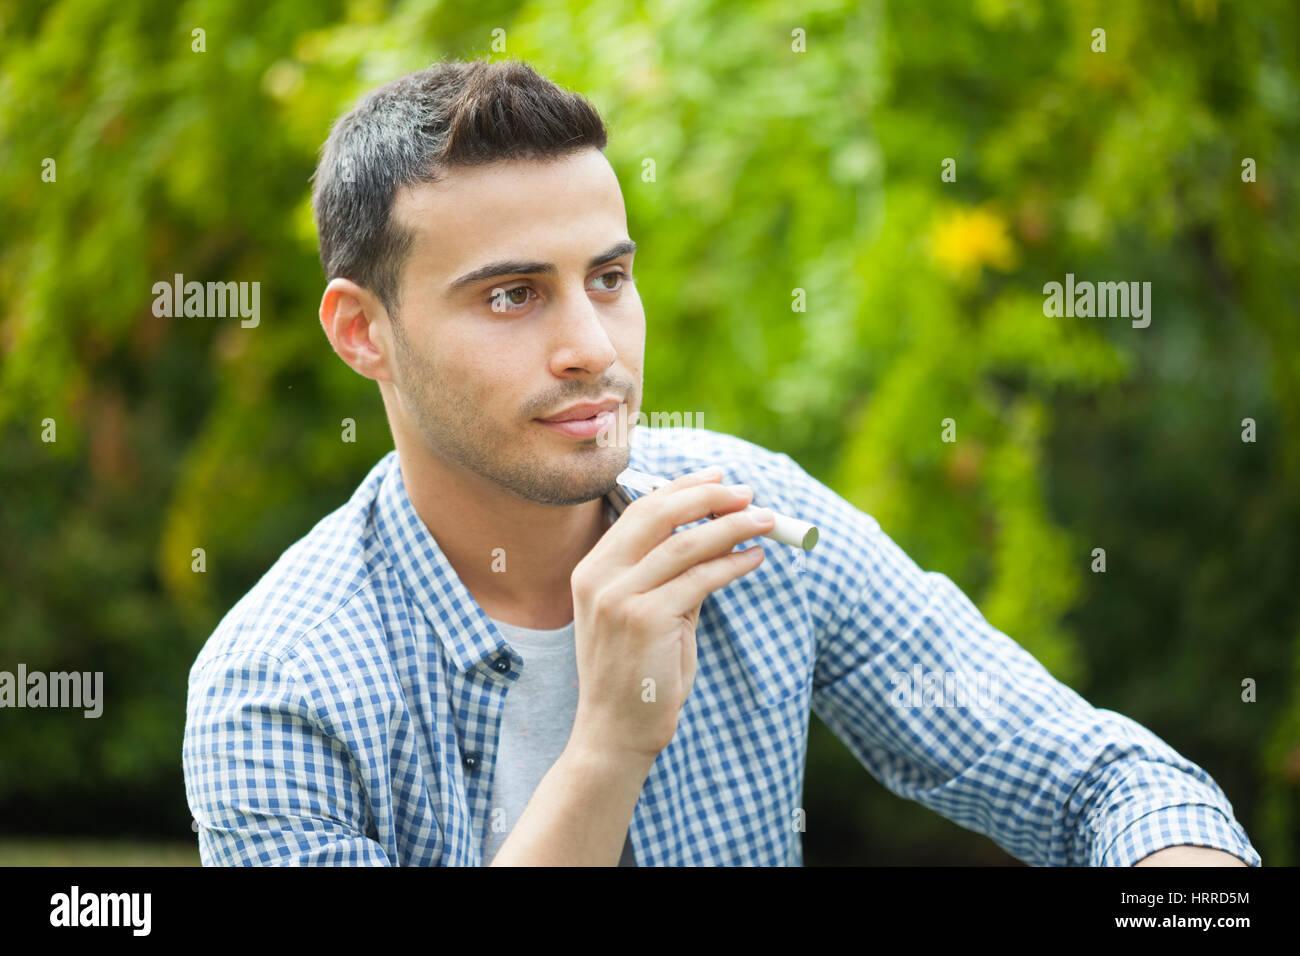 Man smoking an electronic cigarette outdoor - Stock Image